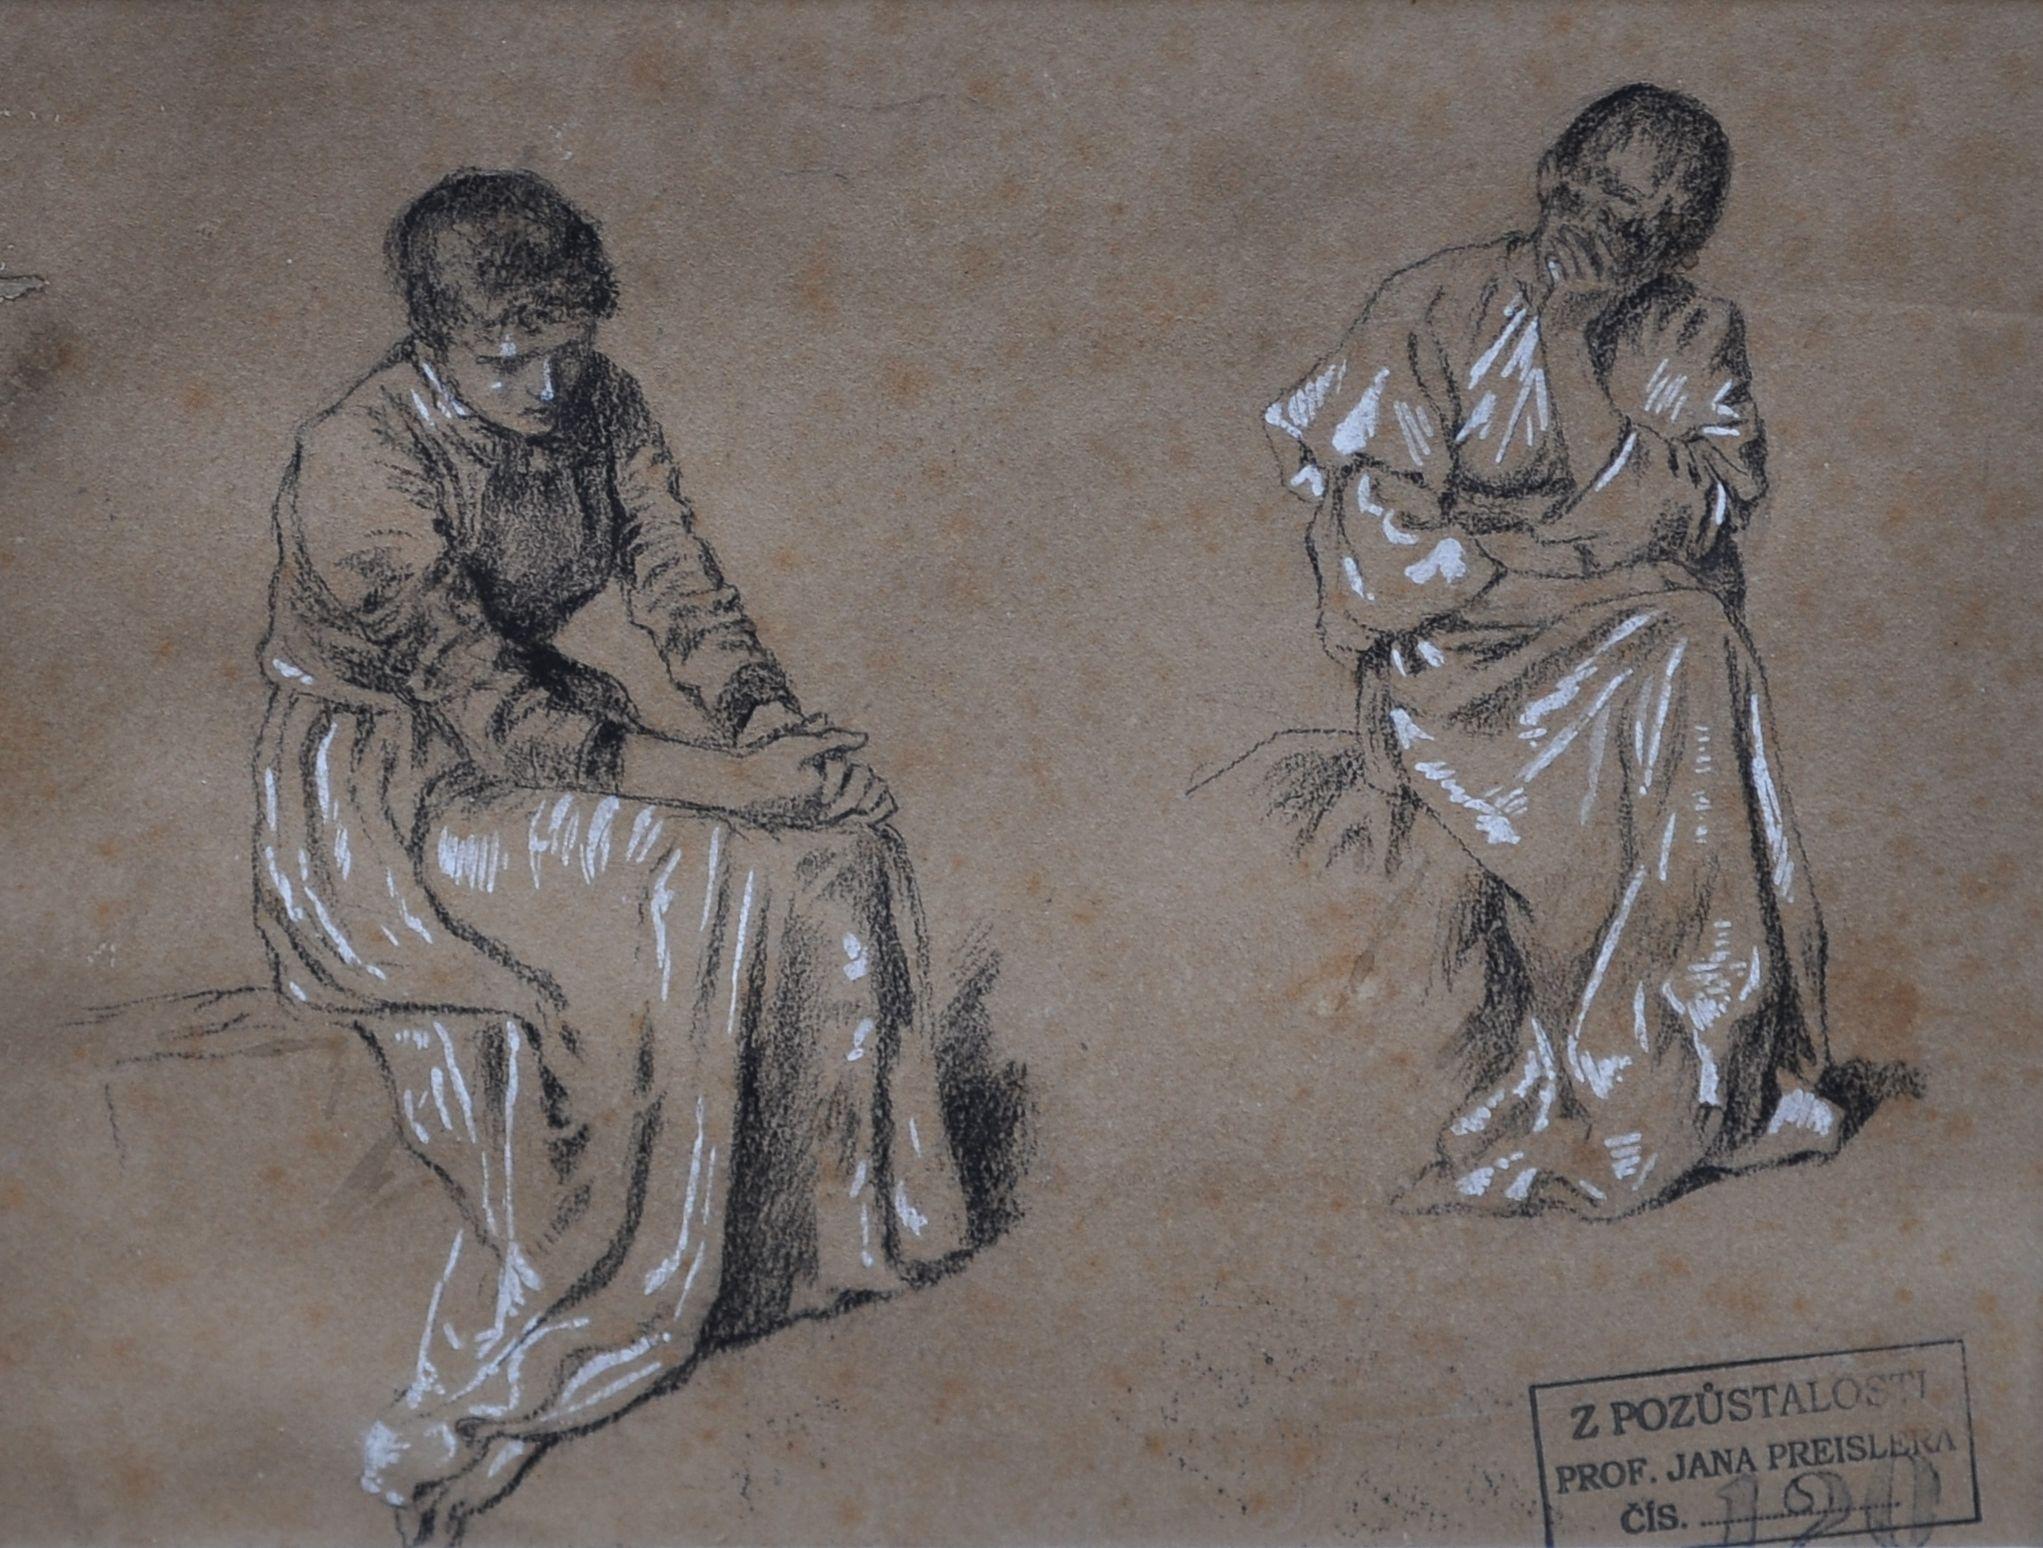 Jan Preisler 2 Zeny Studijni Kresba Czech Antiques